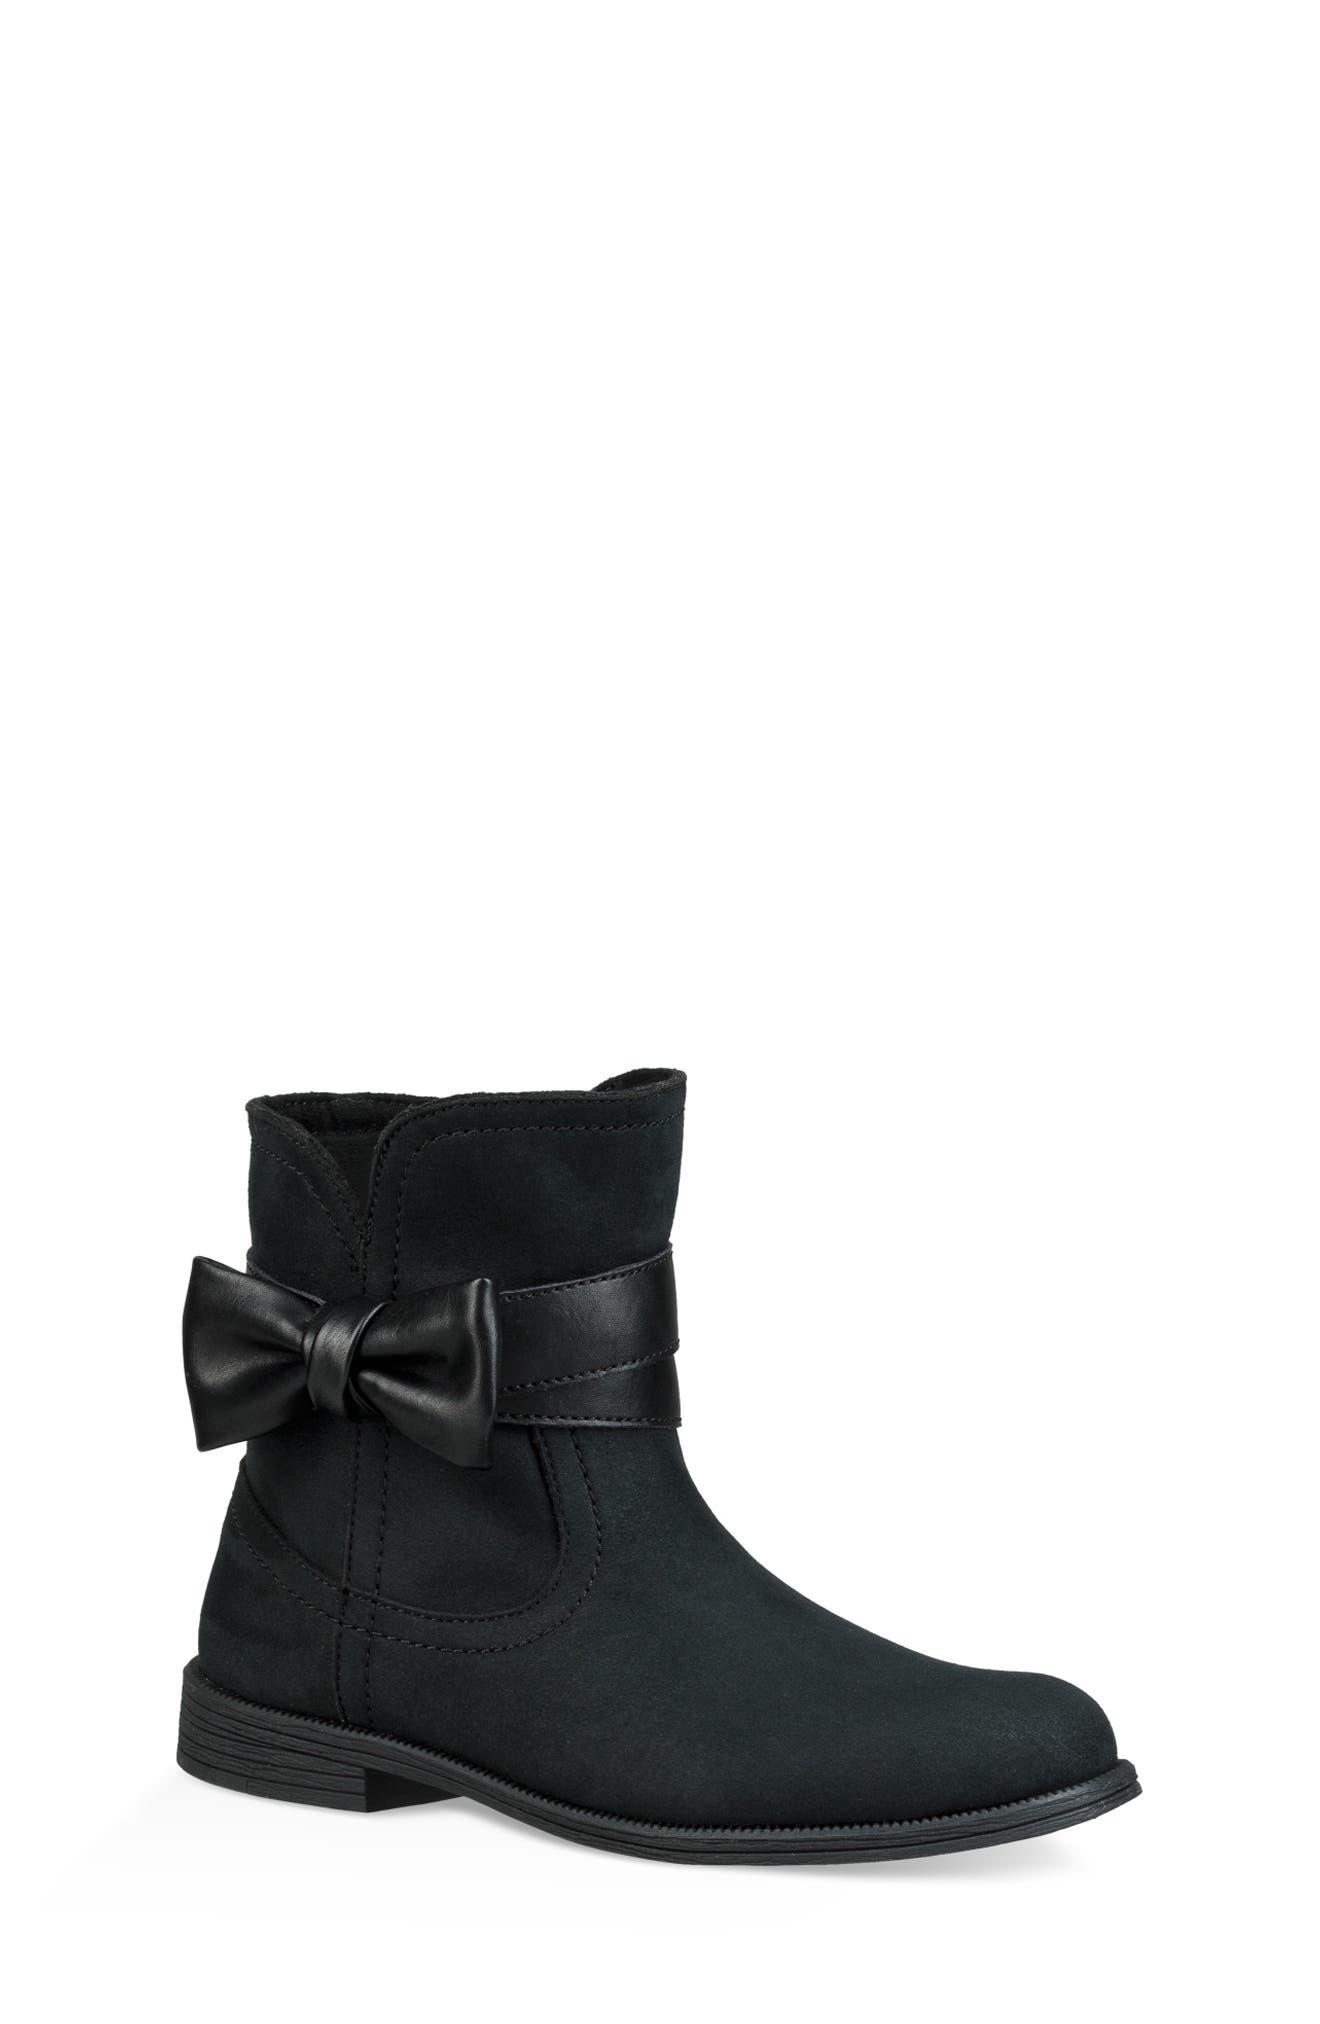 UGG<SUP>®</SUP>, UGG Joanie Bow Boot, Main thumbnail 1, color, BLACK